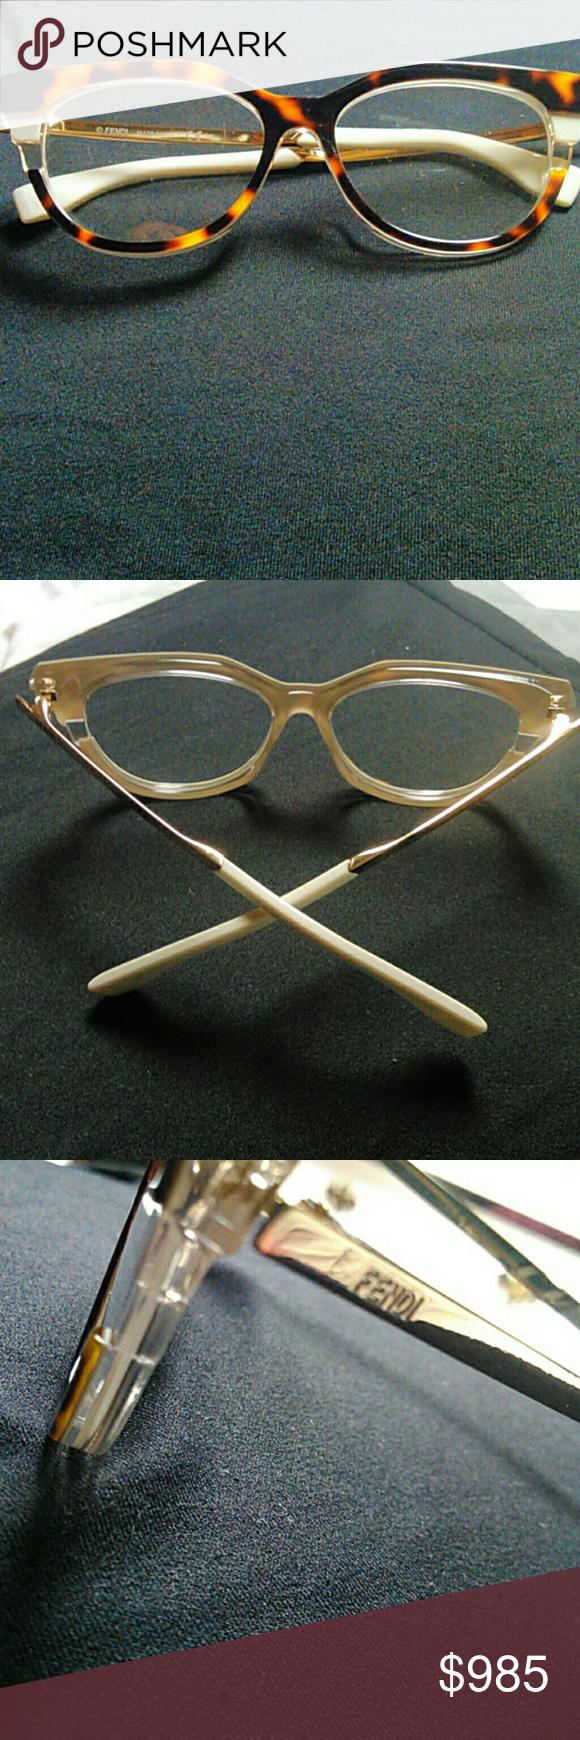 d7544fdf8a7 Authentic FENDI EYEGLASSES REASONABLE OFFERS WELCO Fendi rare metropolis  o culos de grau frames Fendi Accessories Glasses